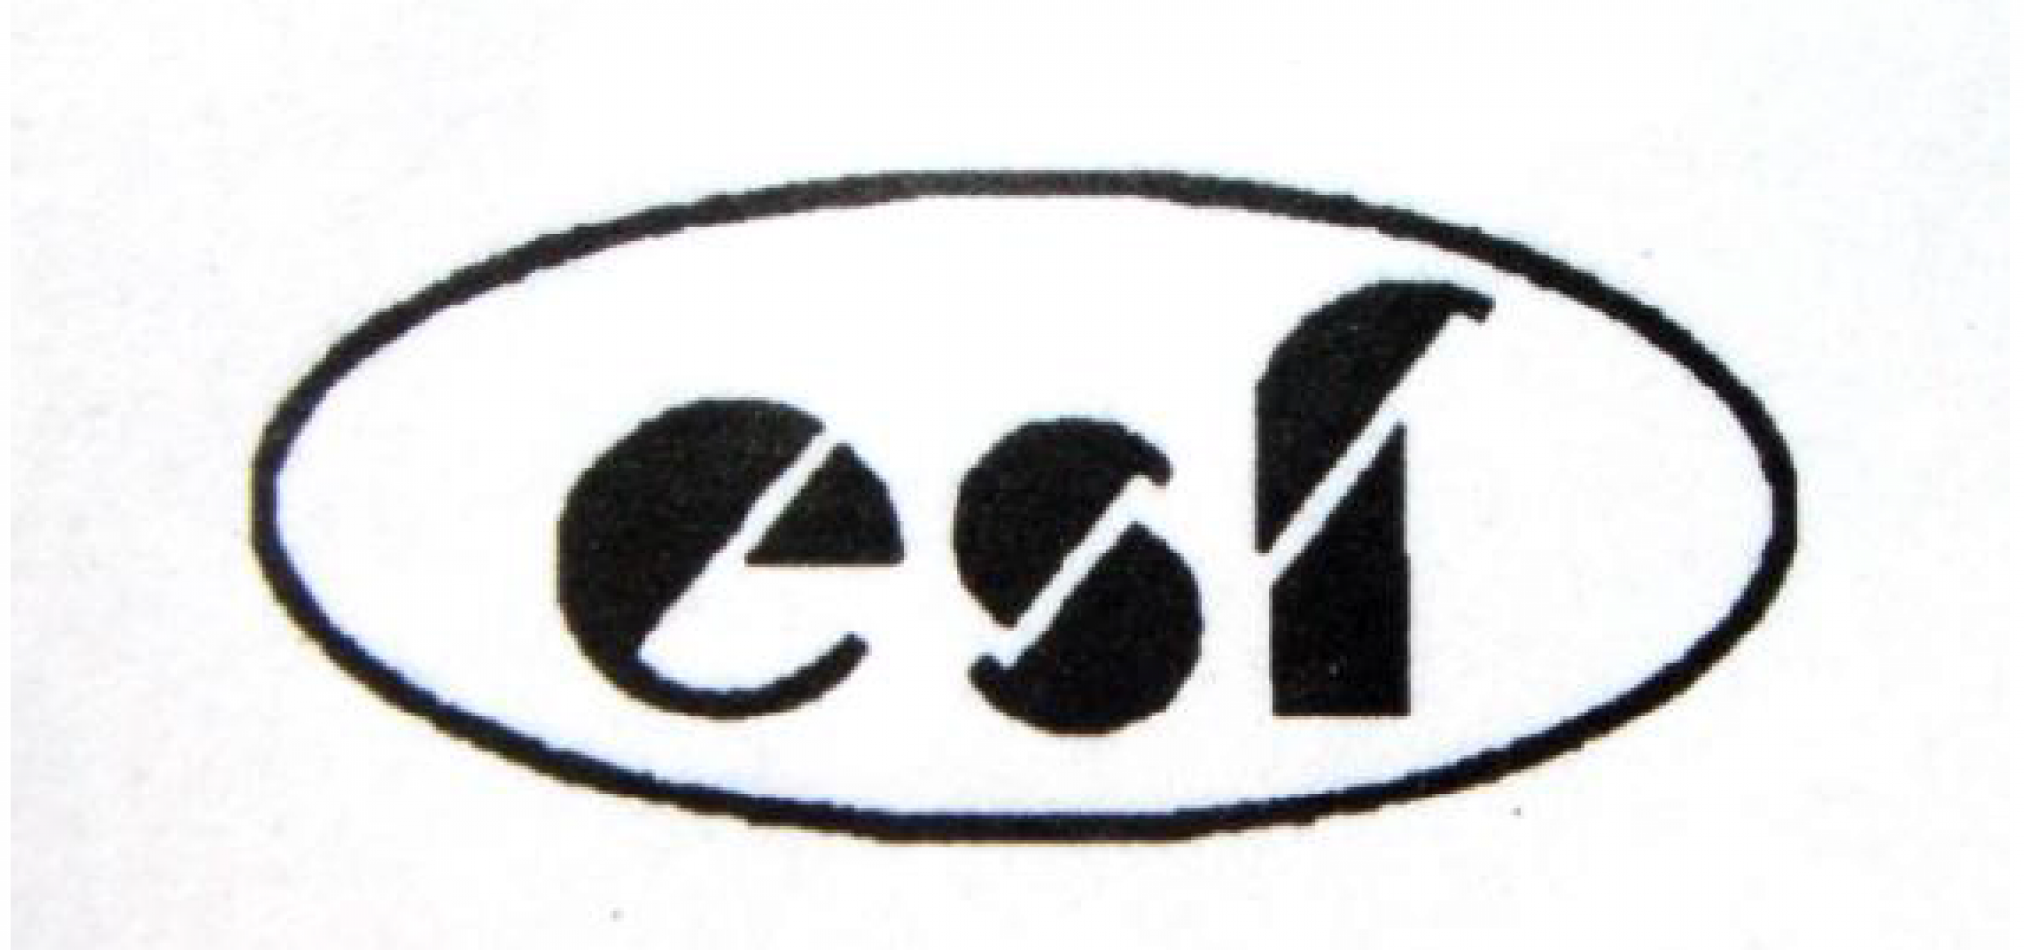 CHAHGZHOU YINGSHIFENG TEXTILE AND DYEING CO., LTD